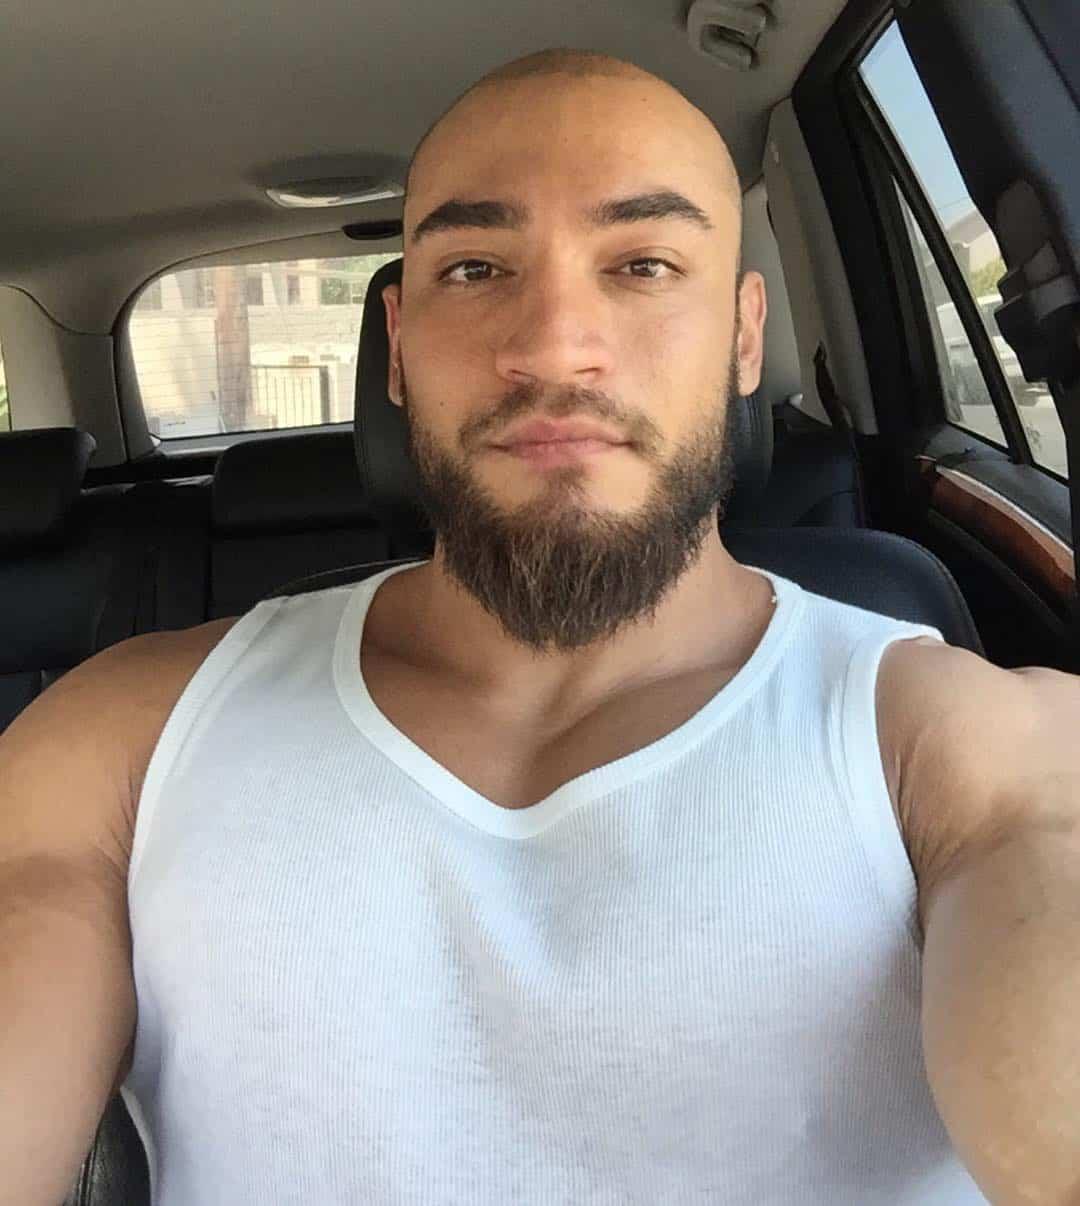 Awe Inspiring 20 Reasons To Be Bald With Beard Machos Style Short Hairstyles For Black Women Fulllsitofus